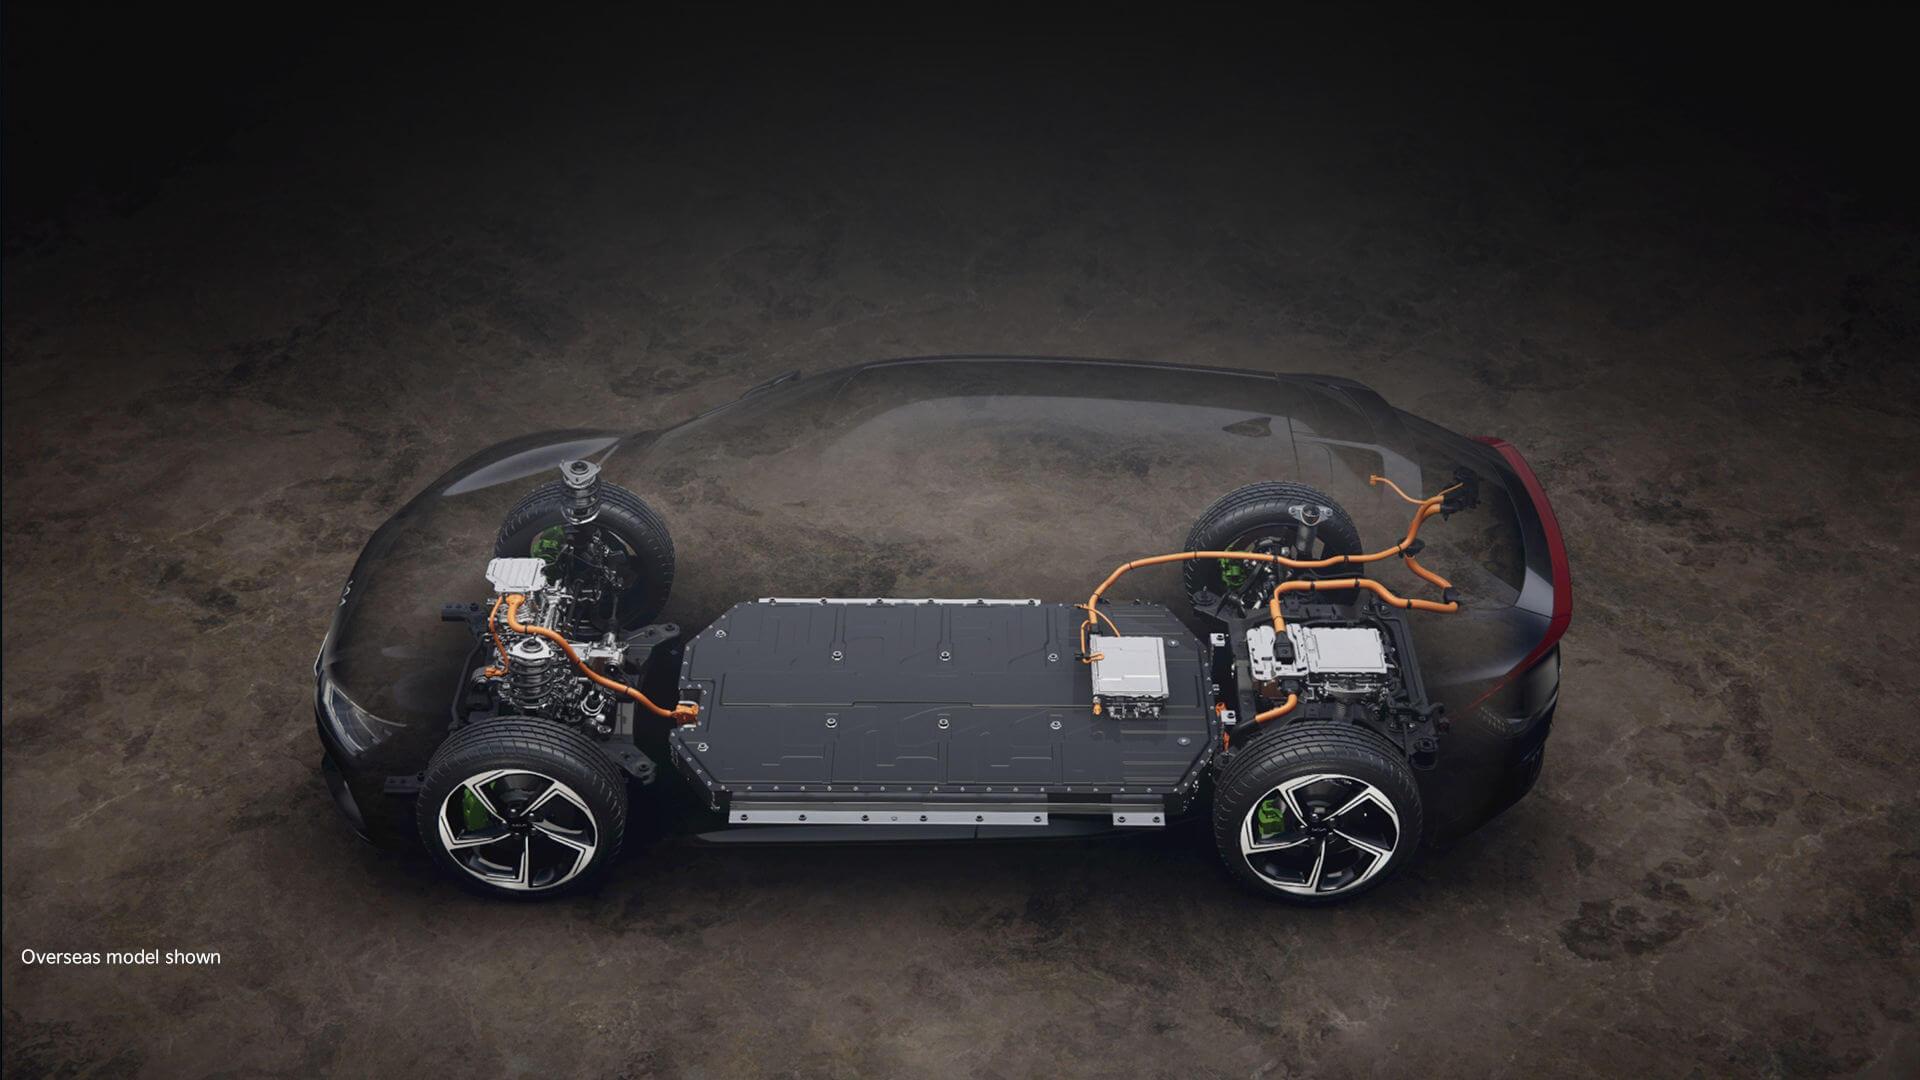 A new platform. A new era of Kia. Image